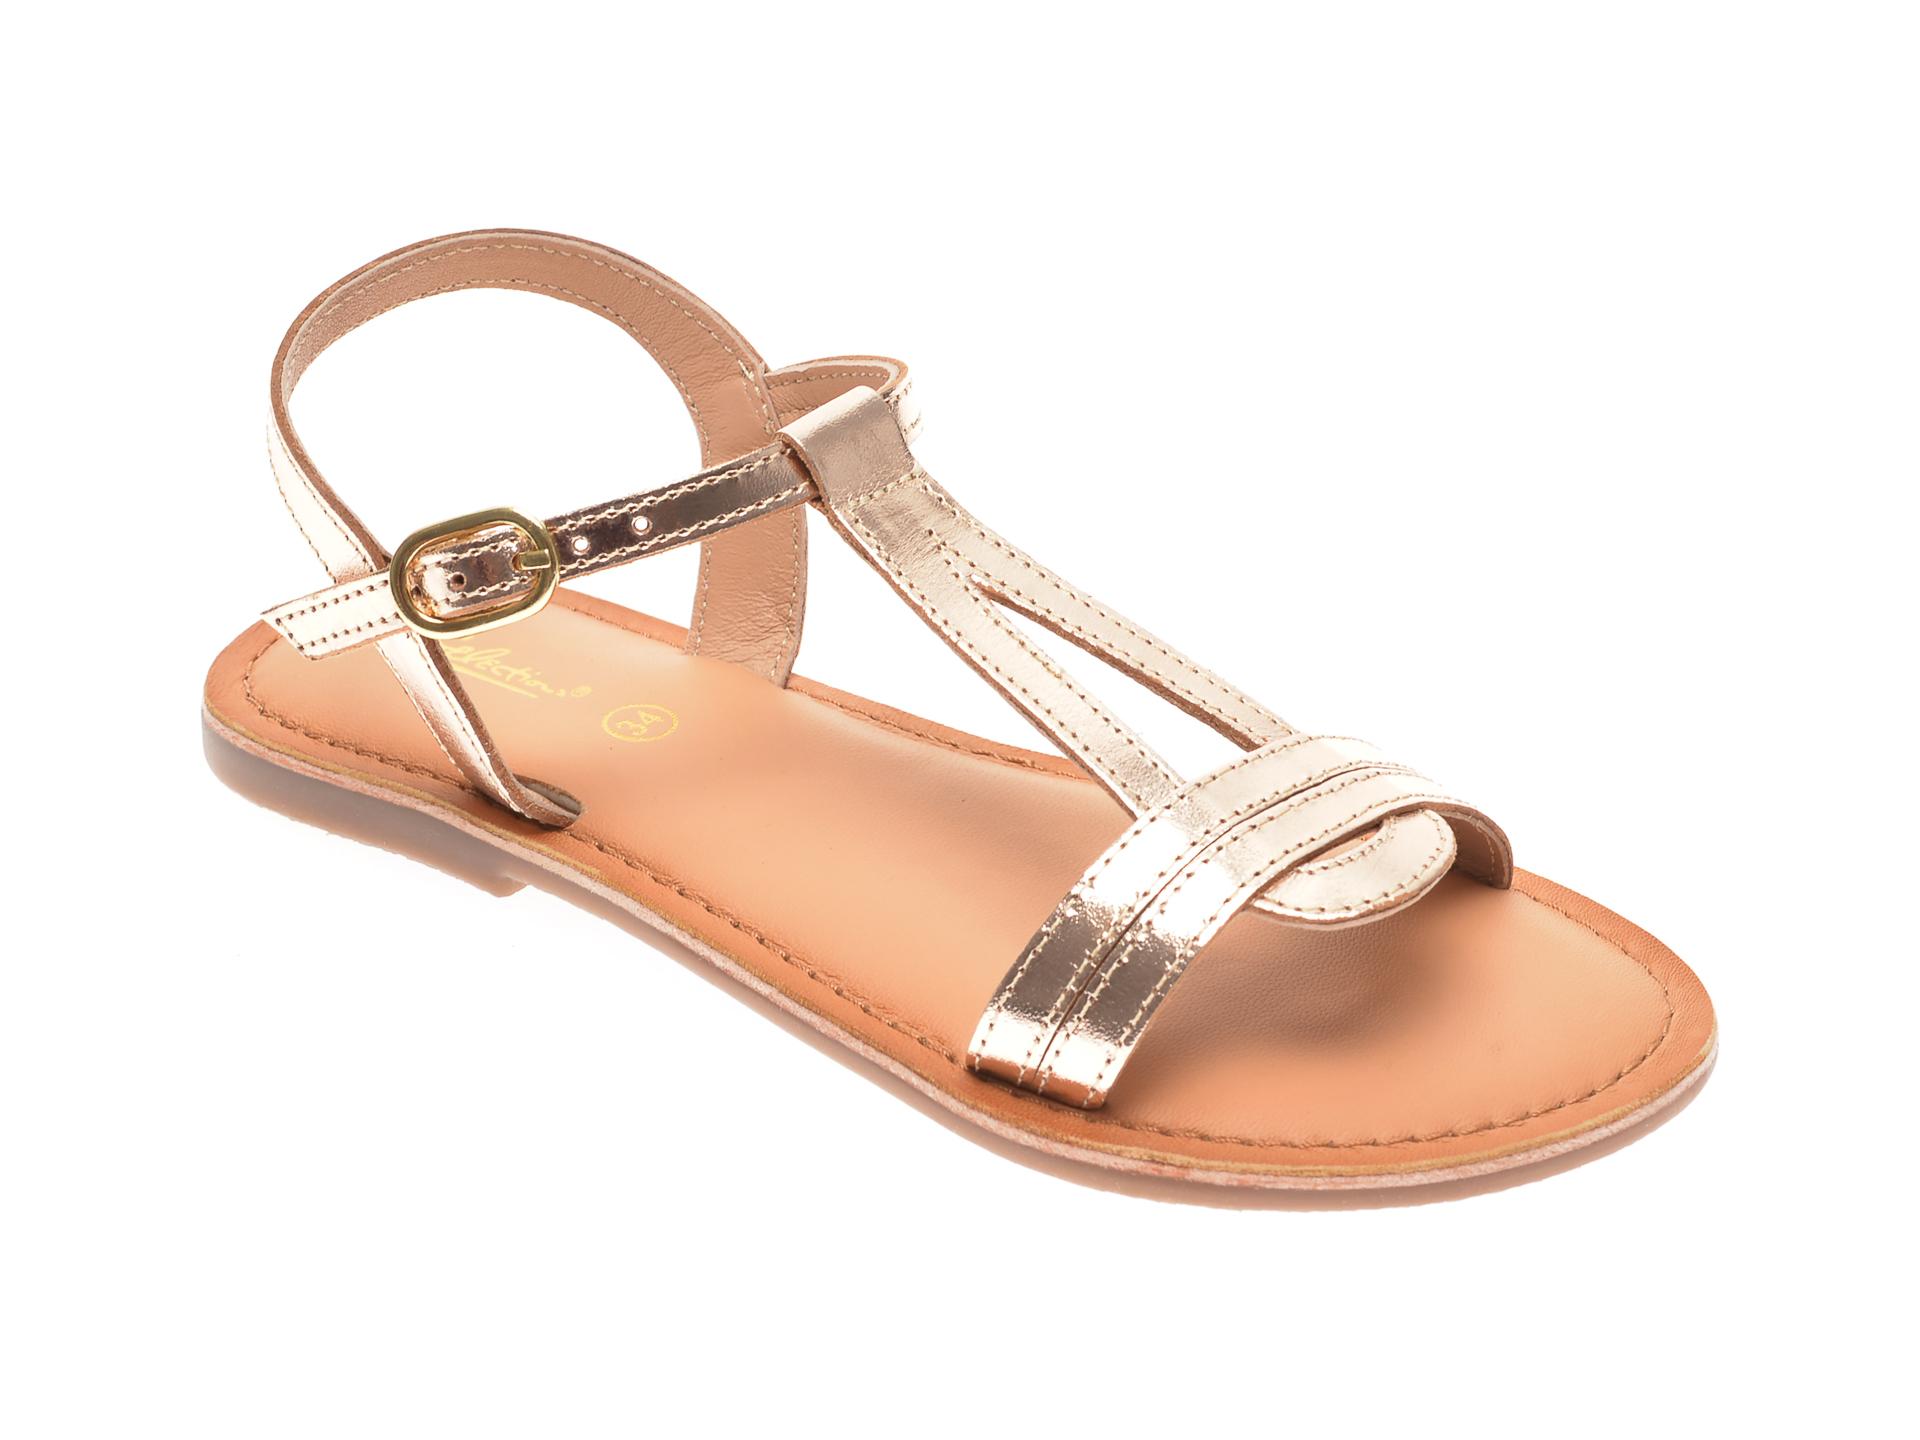 Sandale SELECTION KIDS aurii, SH26, din piele naturala